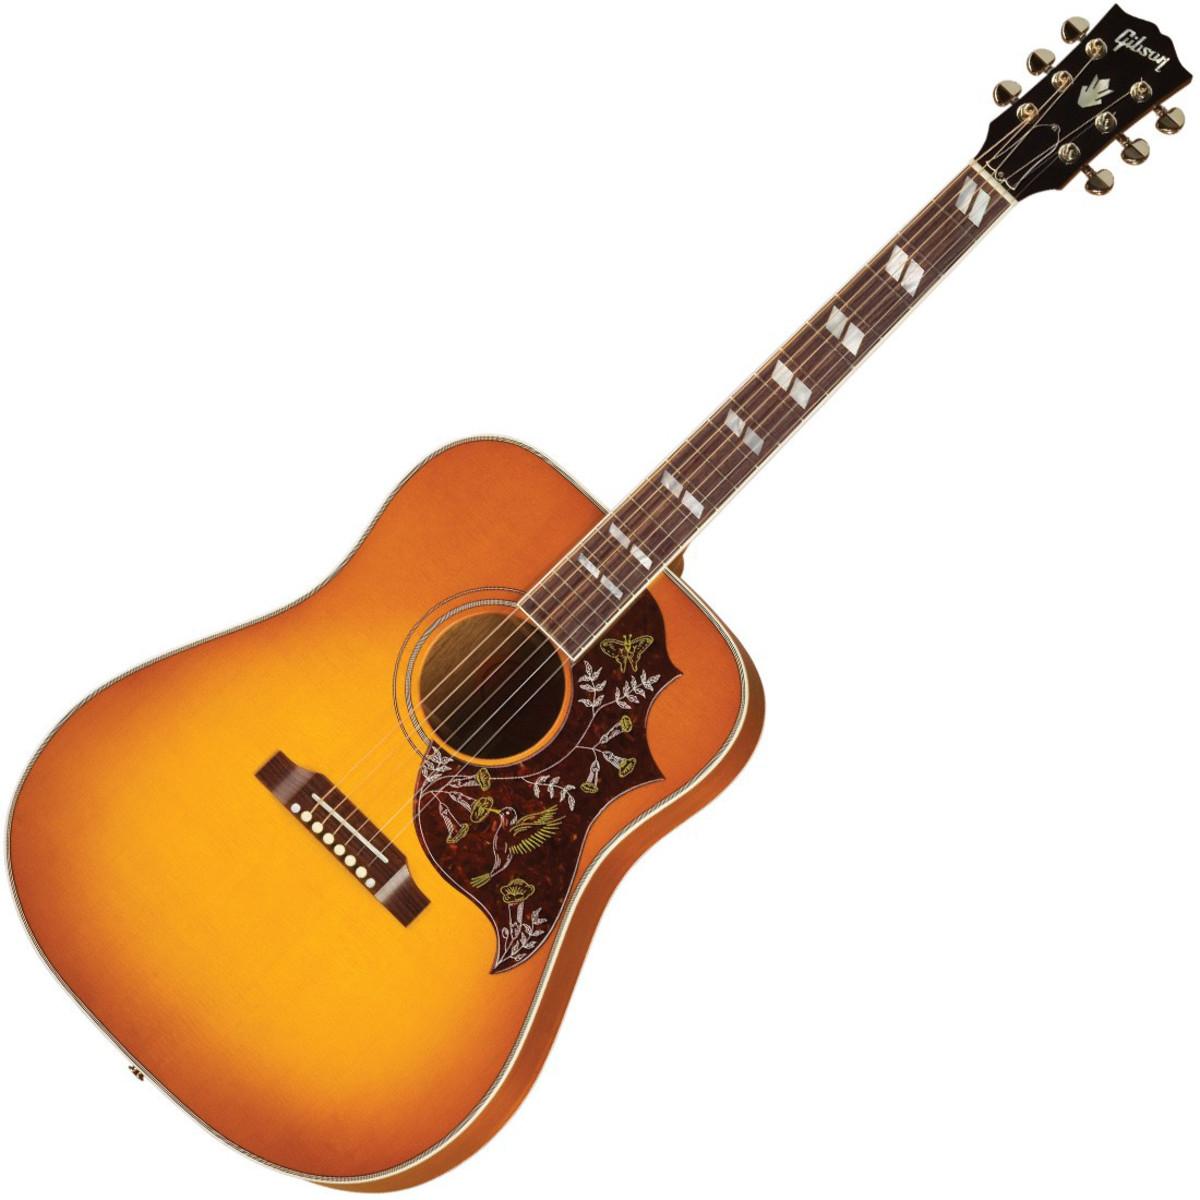 gibson hummingbird electro acoustic guitar heritage cherry sunburst at. Black Bedroom Furniture Sets. Home Design Ideas